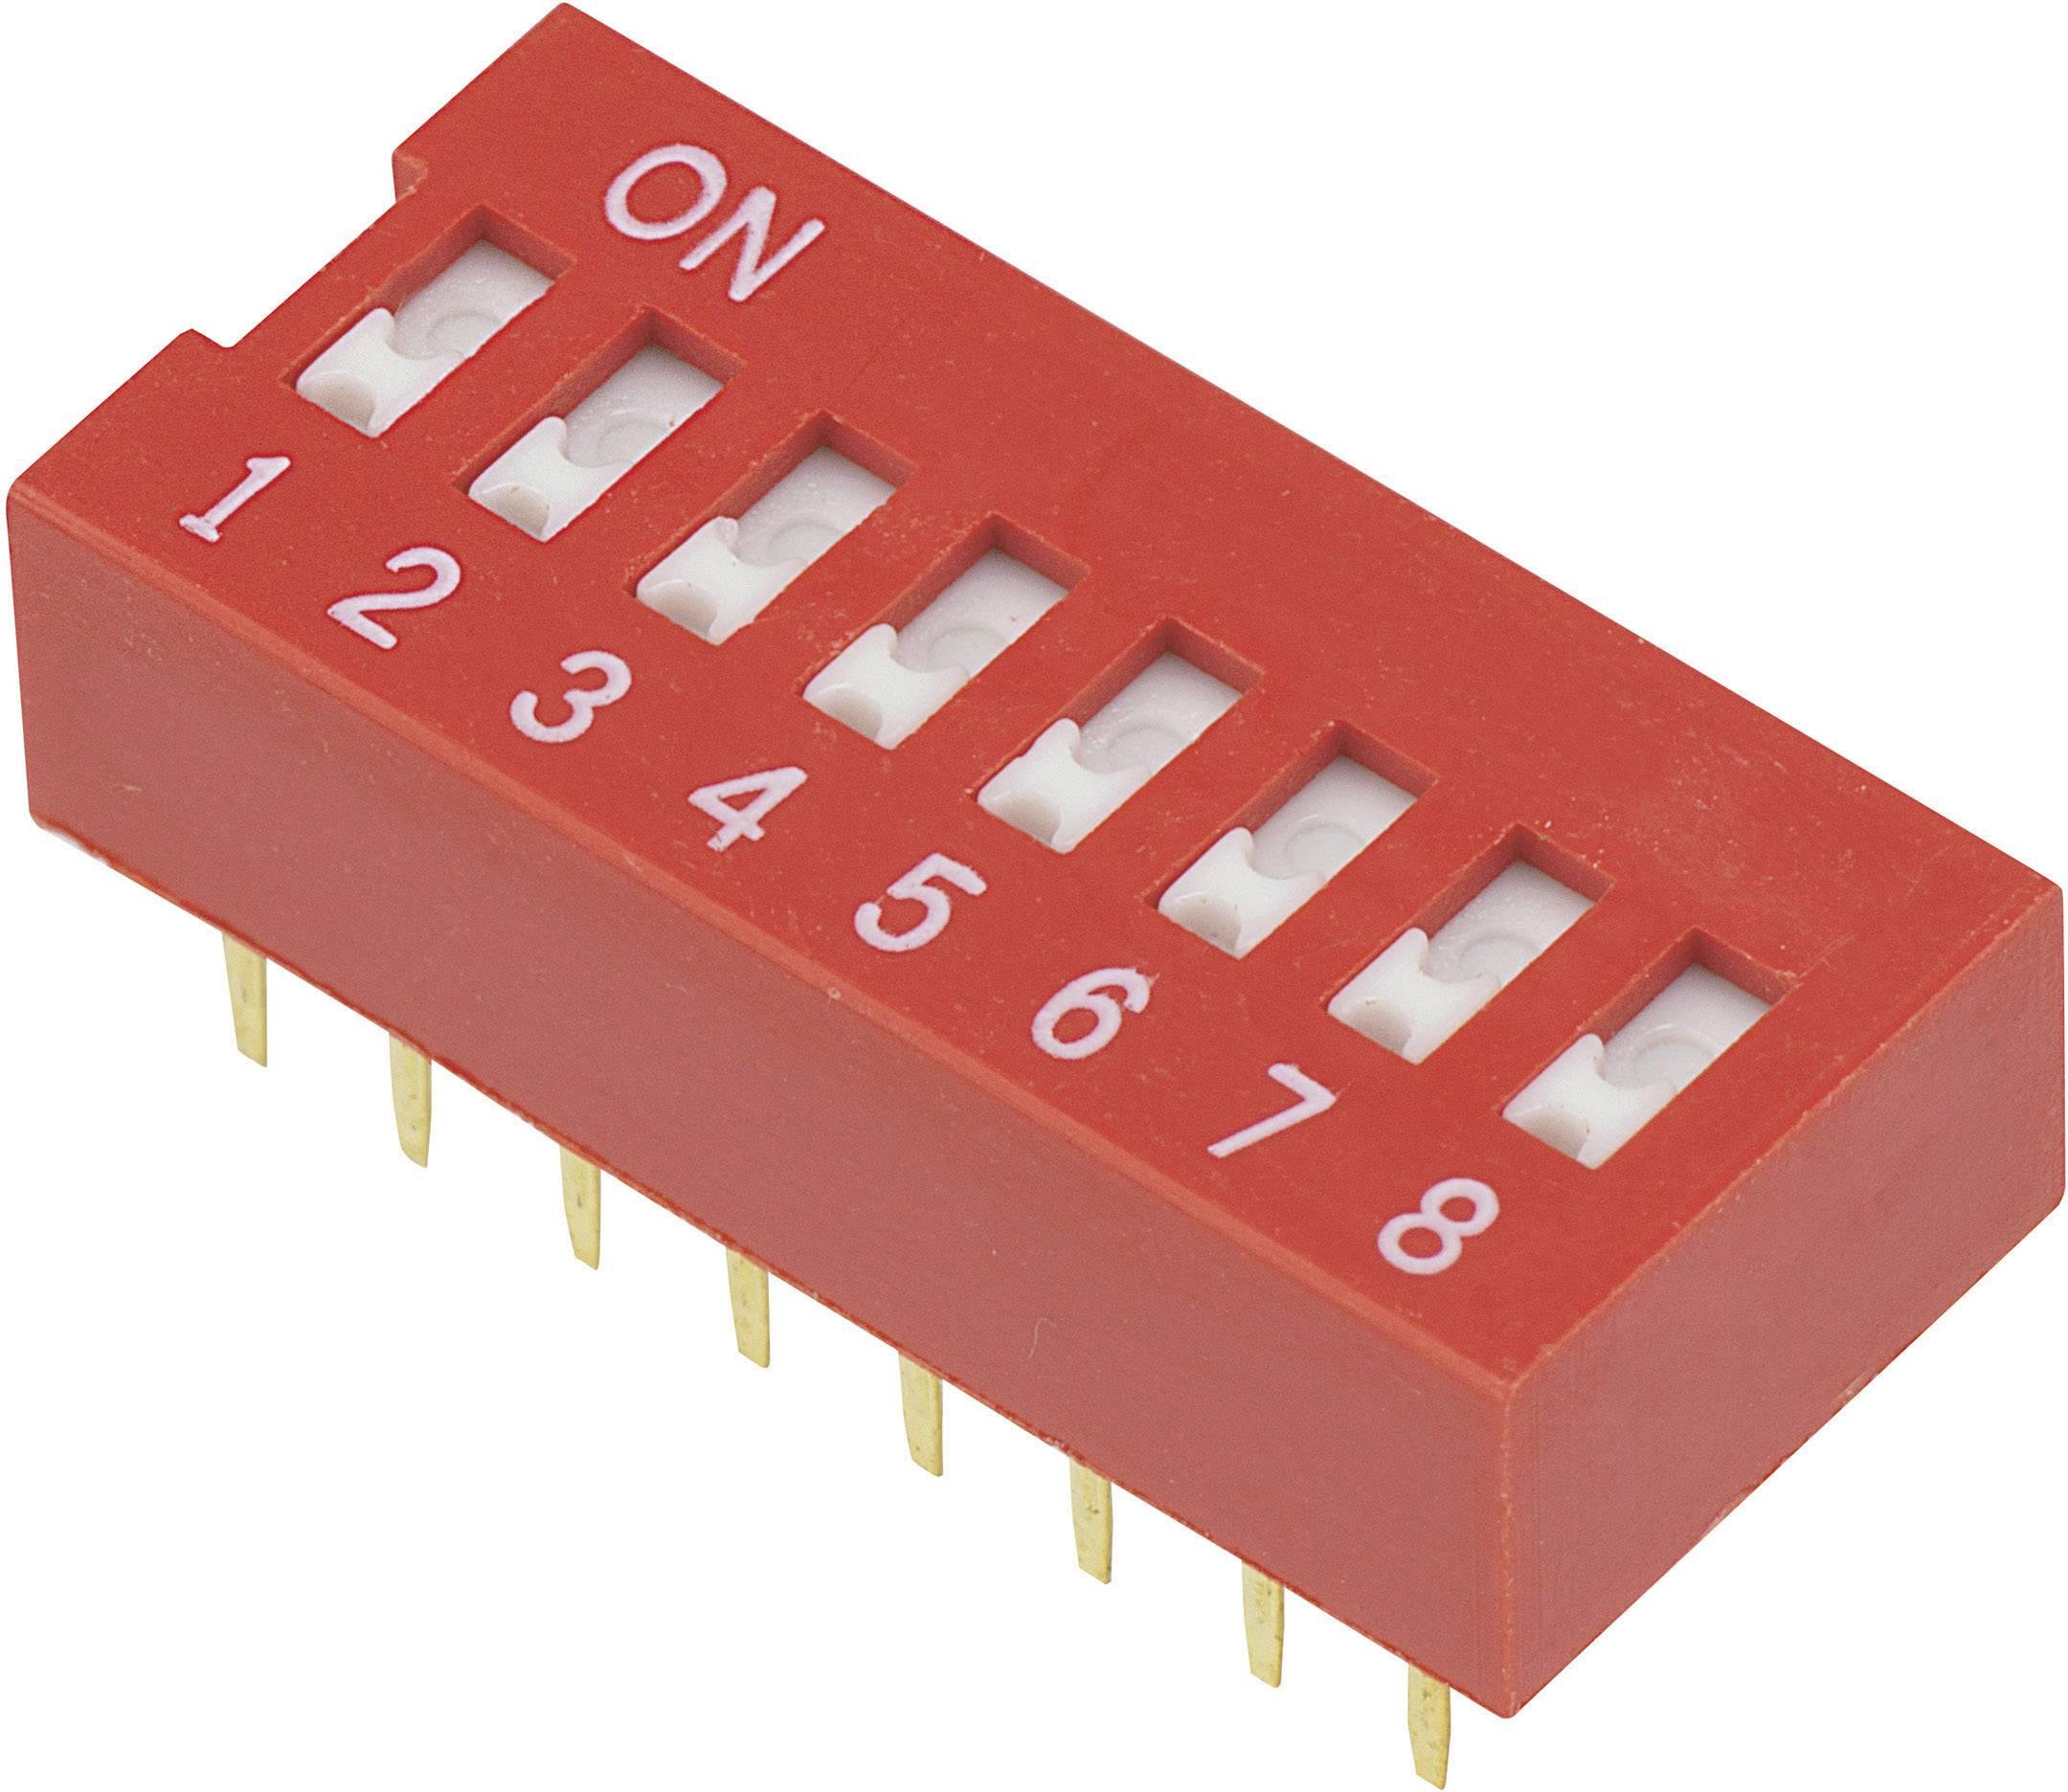 DIP spínač DSR-08, (š x v) 9,9 mm x 5,7 mm